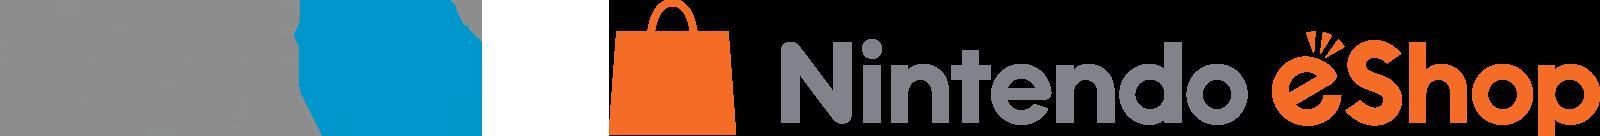 WiiU - Nintendo eShop